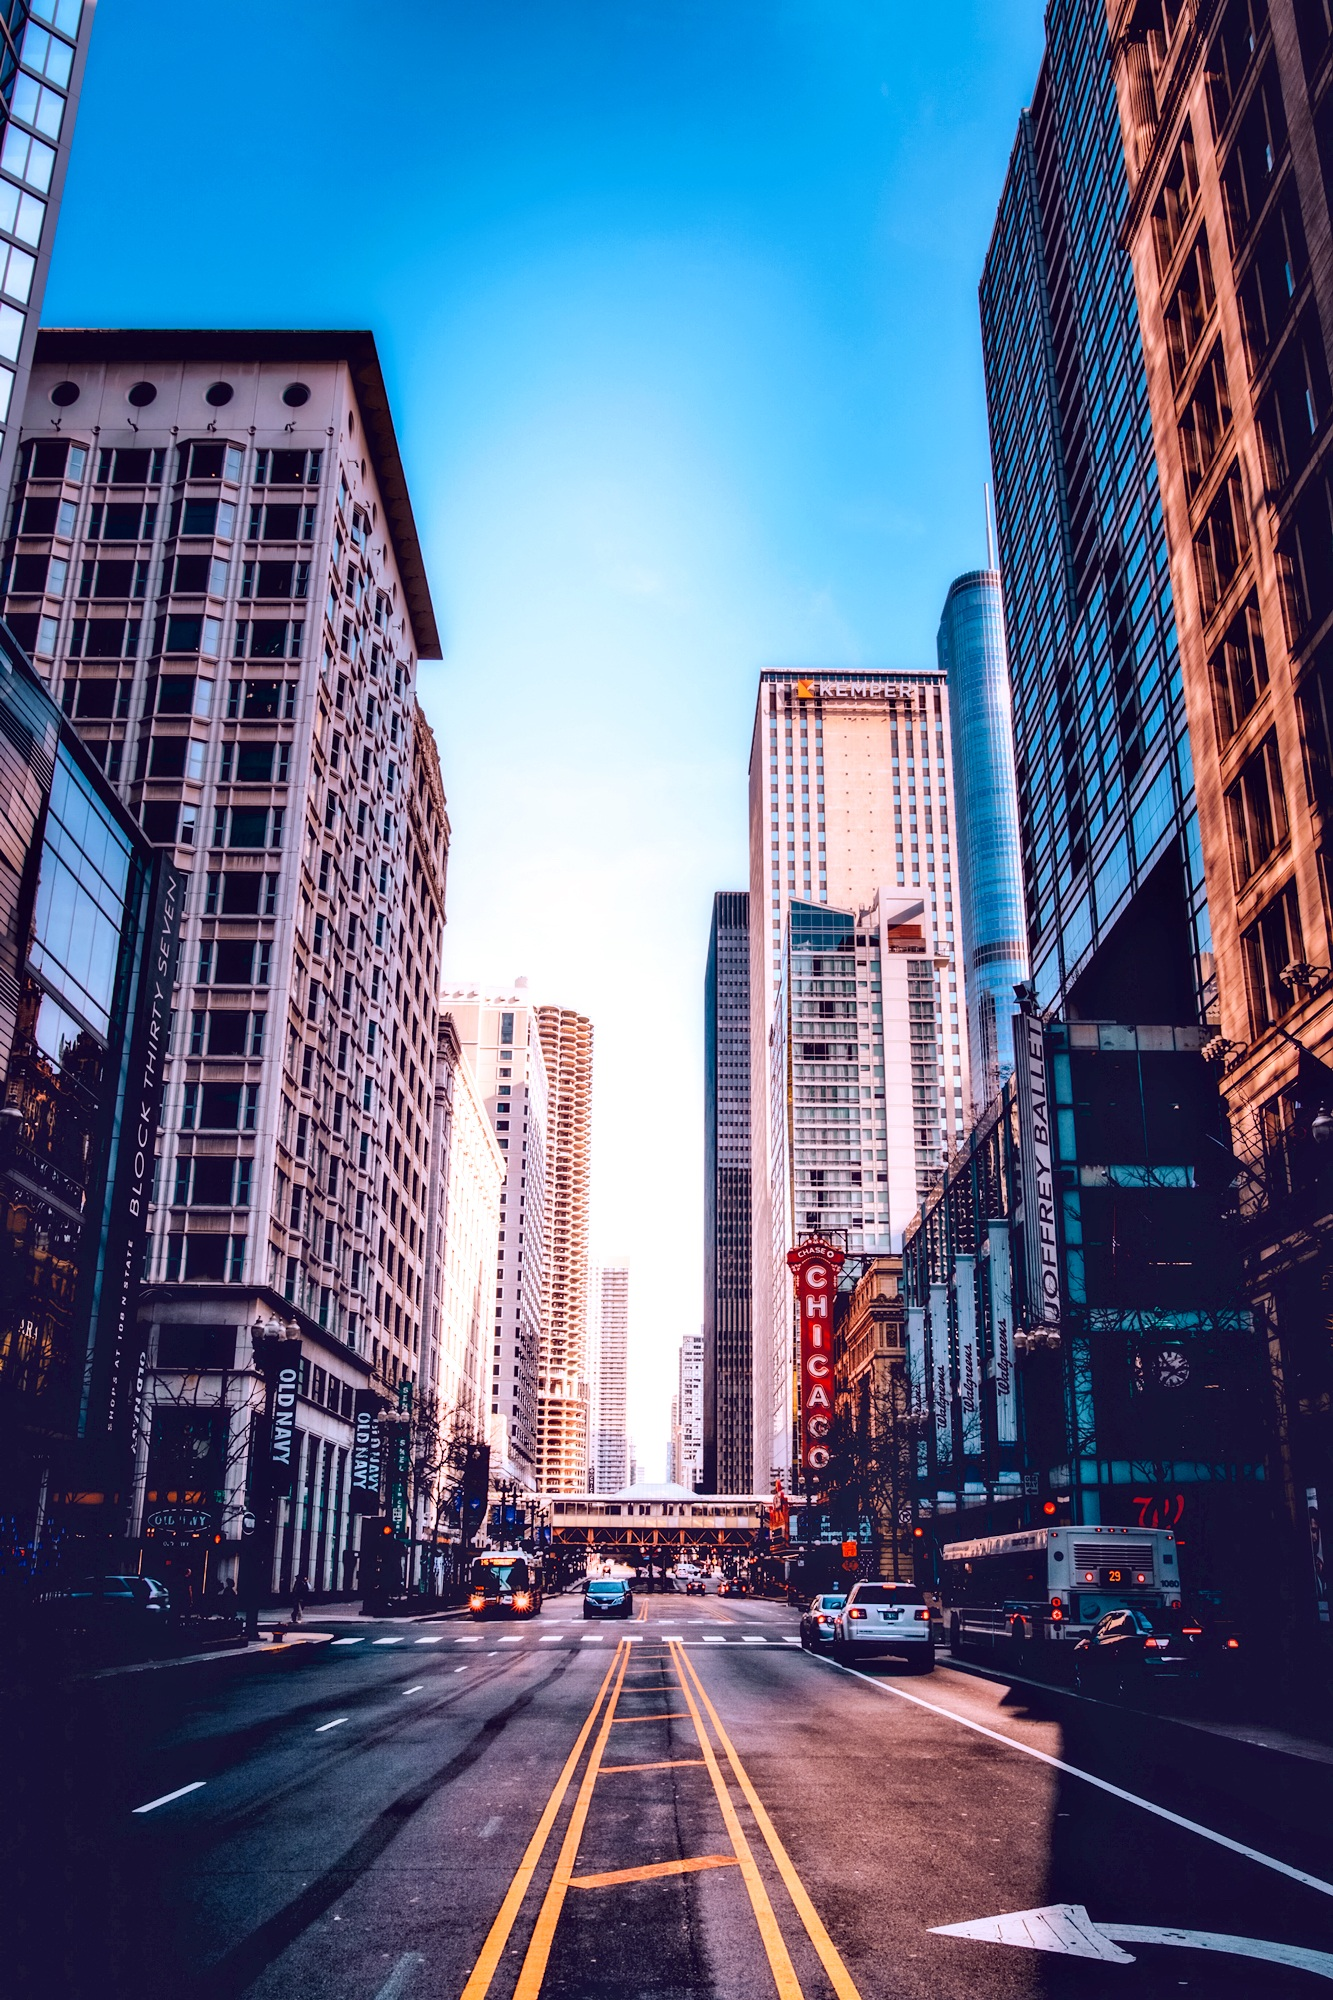 20 Amazing Chicago Photos  Pexels  Free Stock Photos